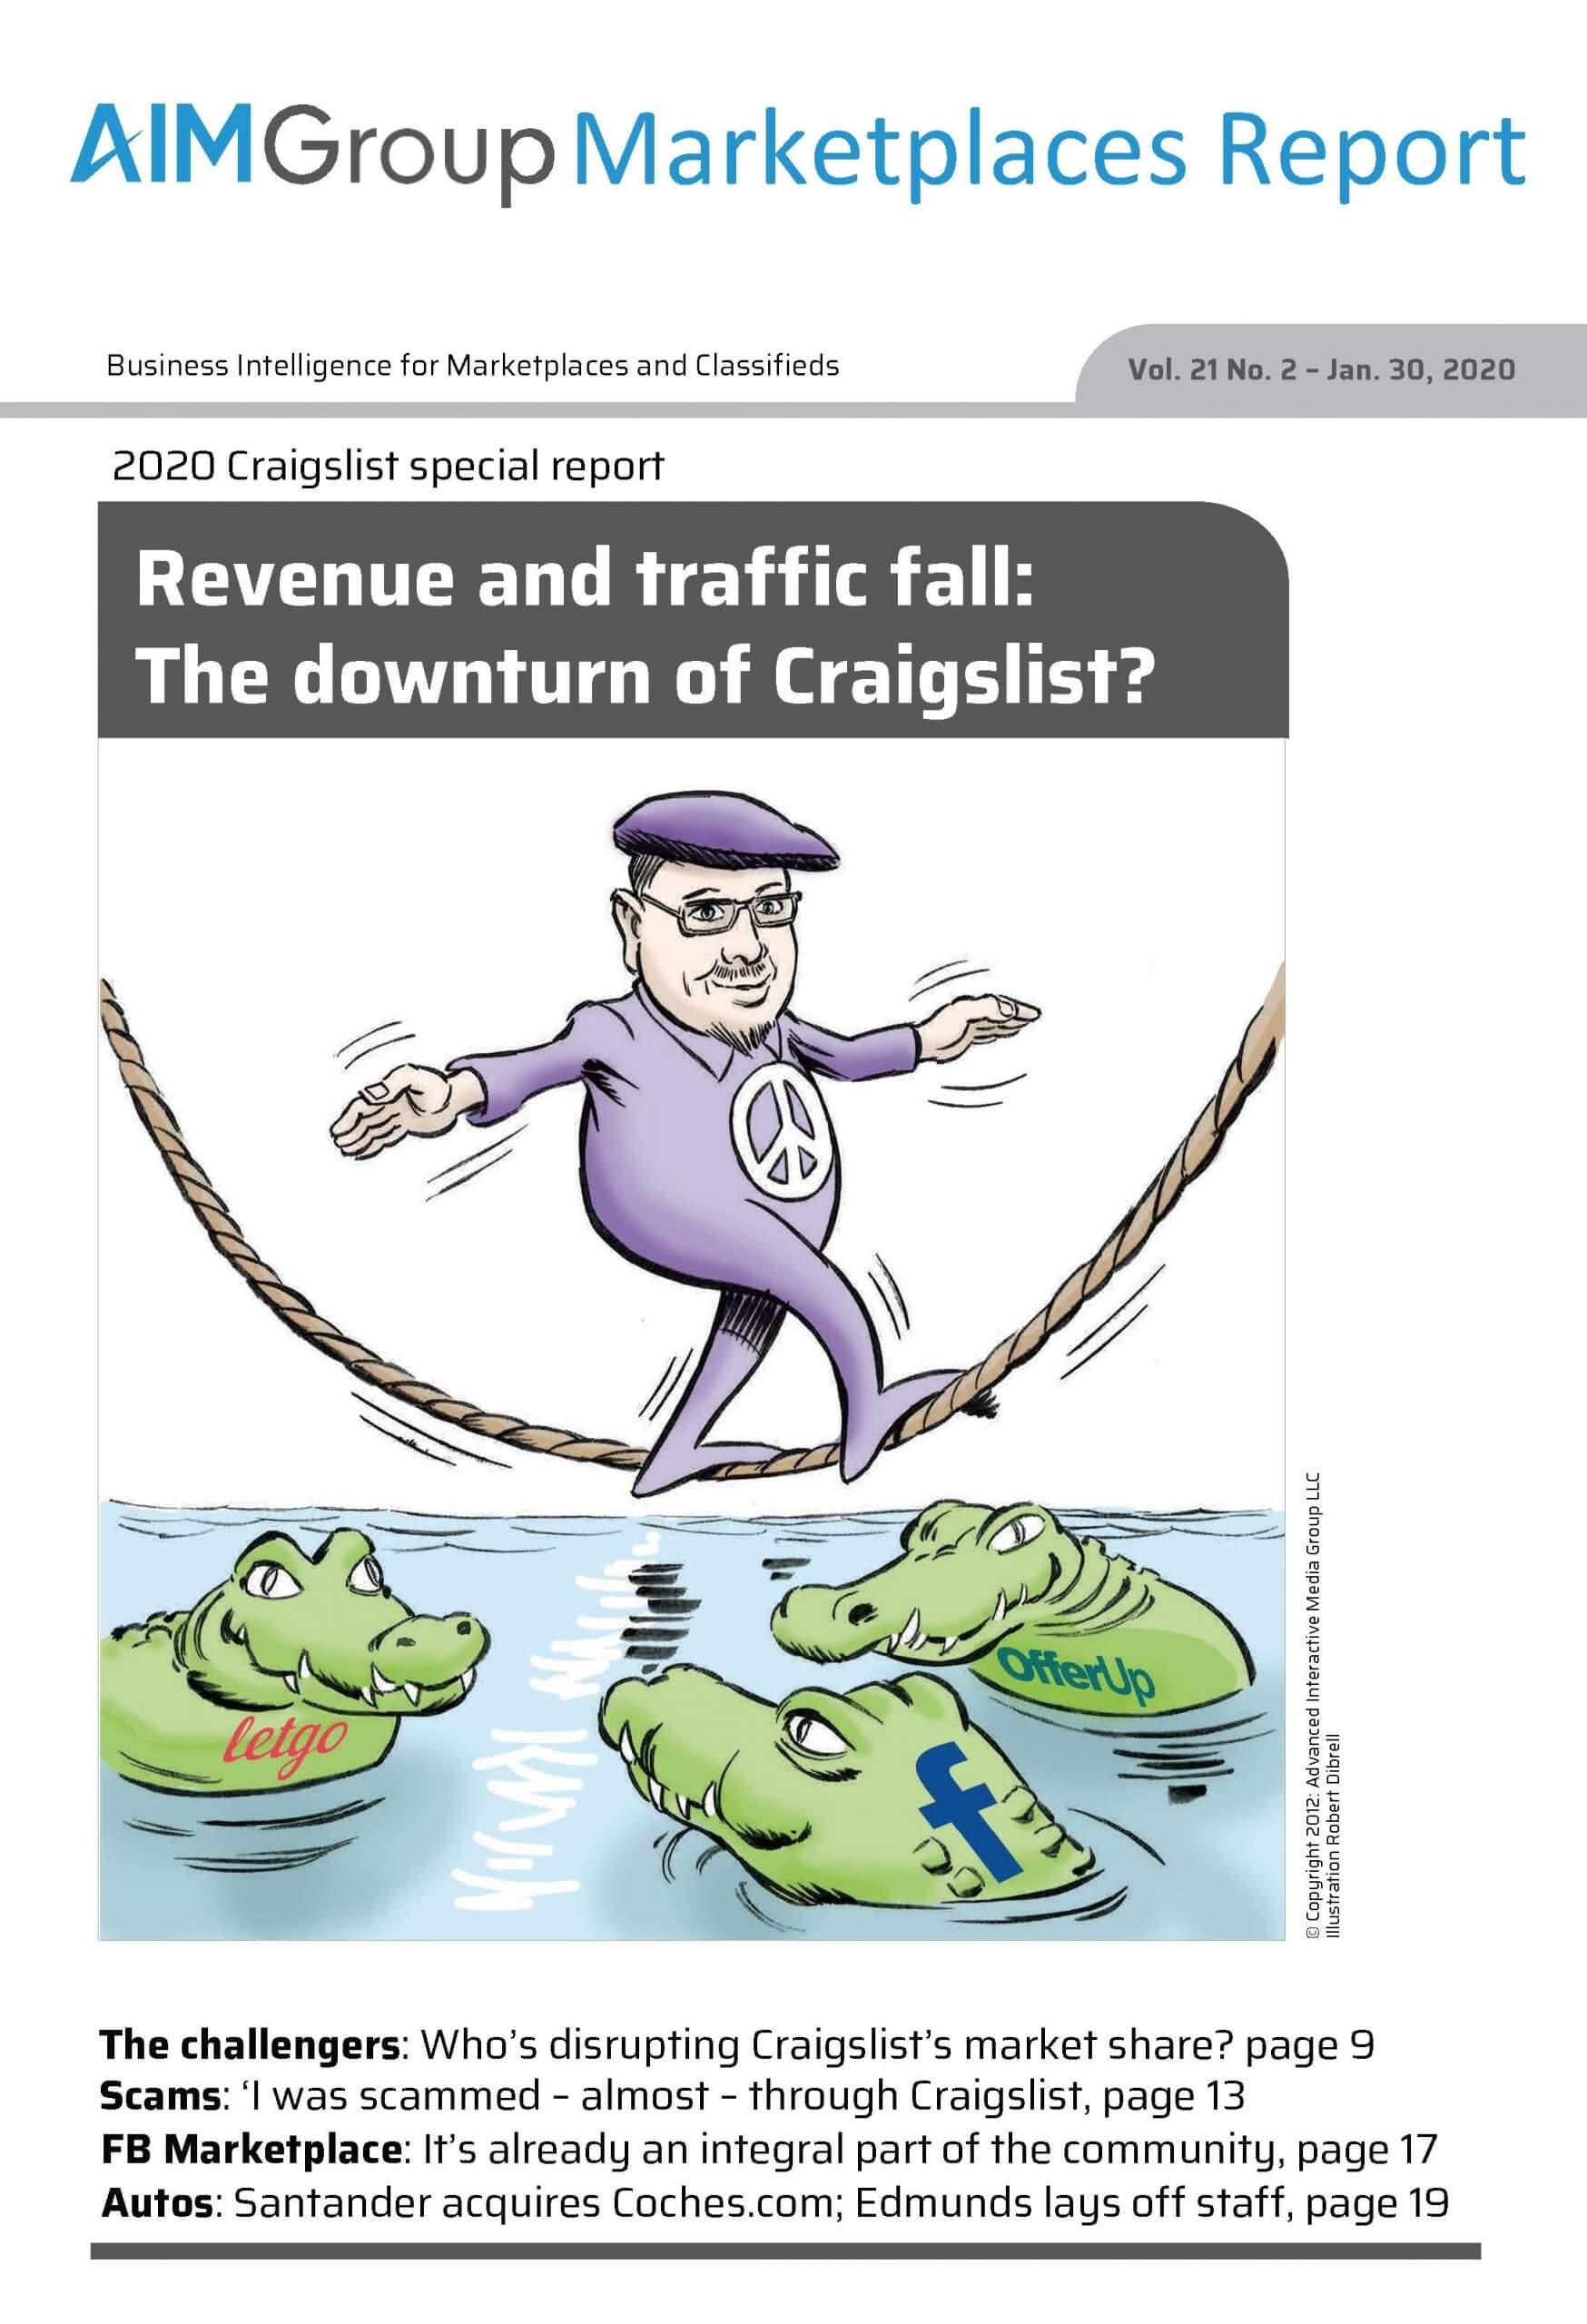 2020 Craigslist Report